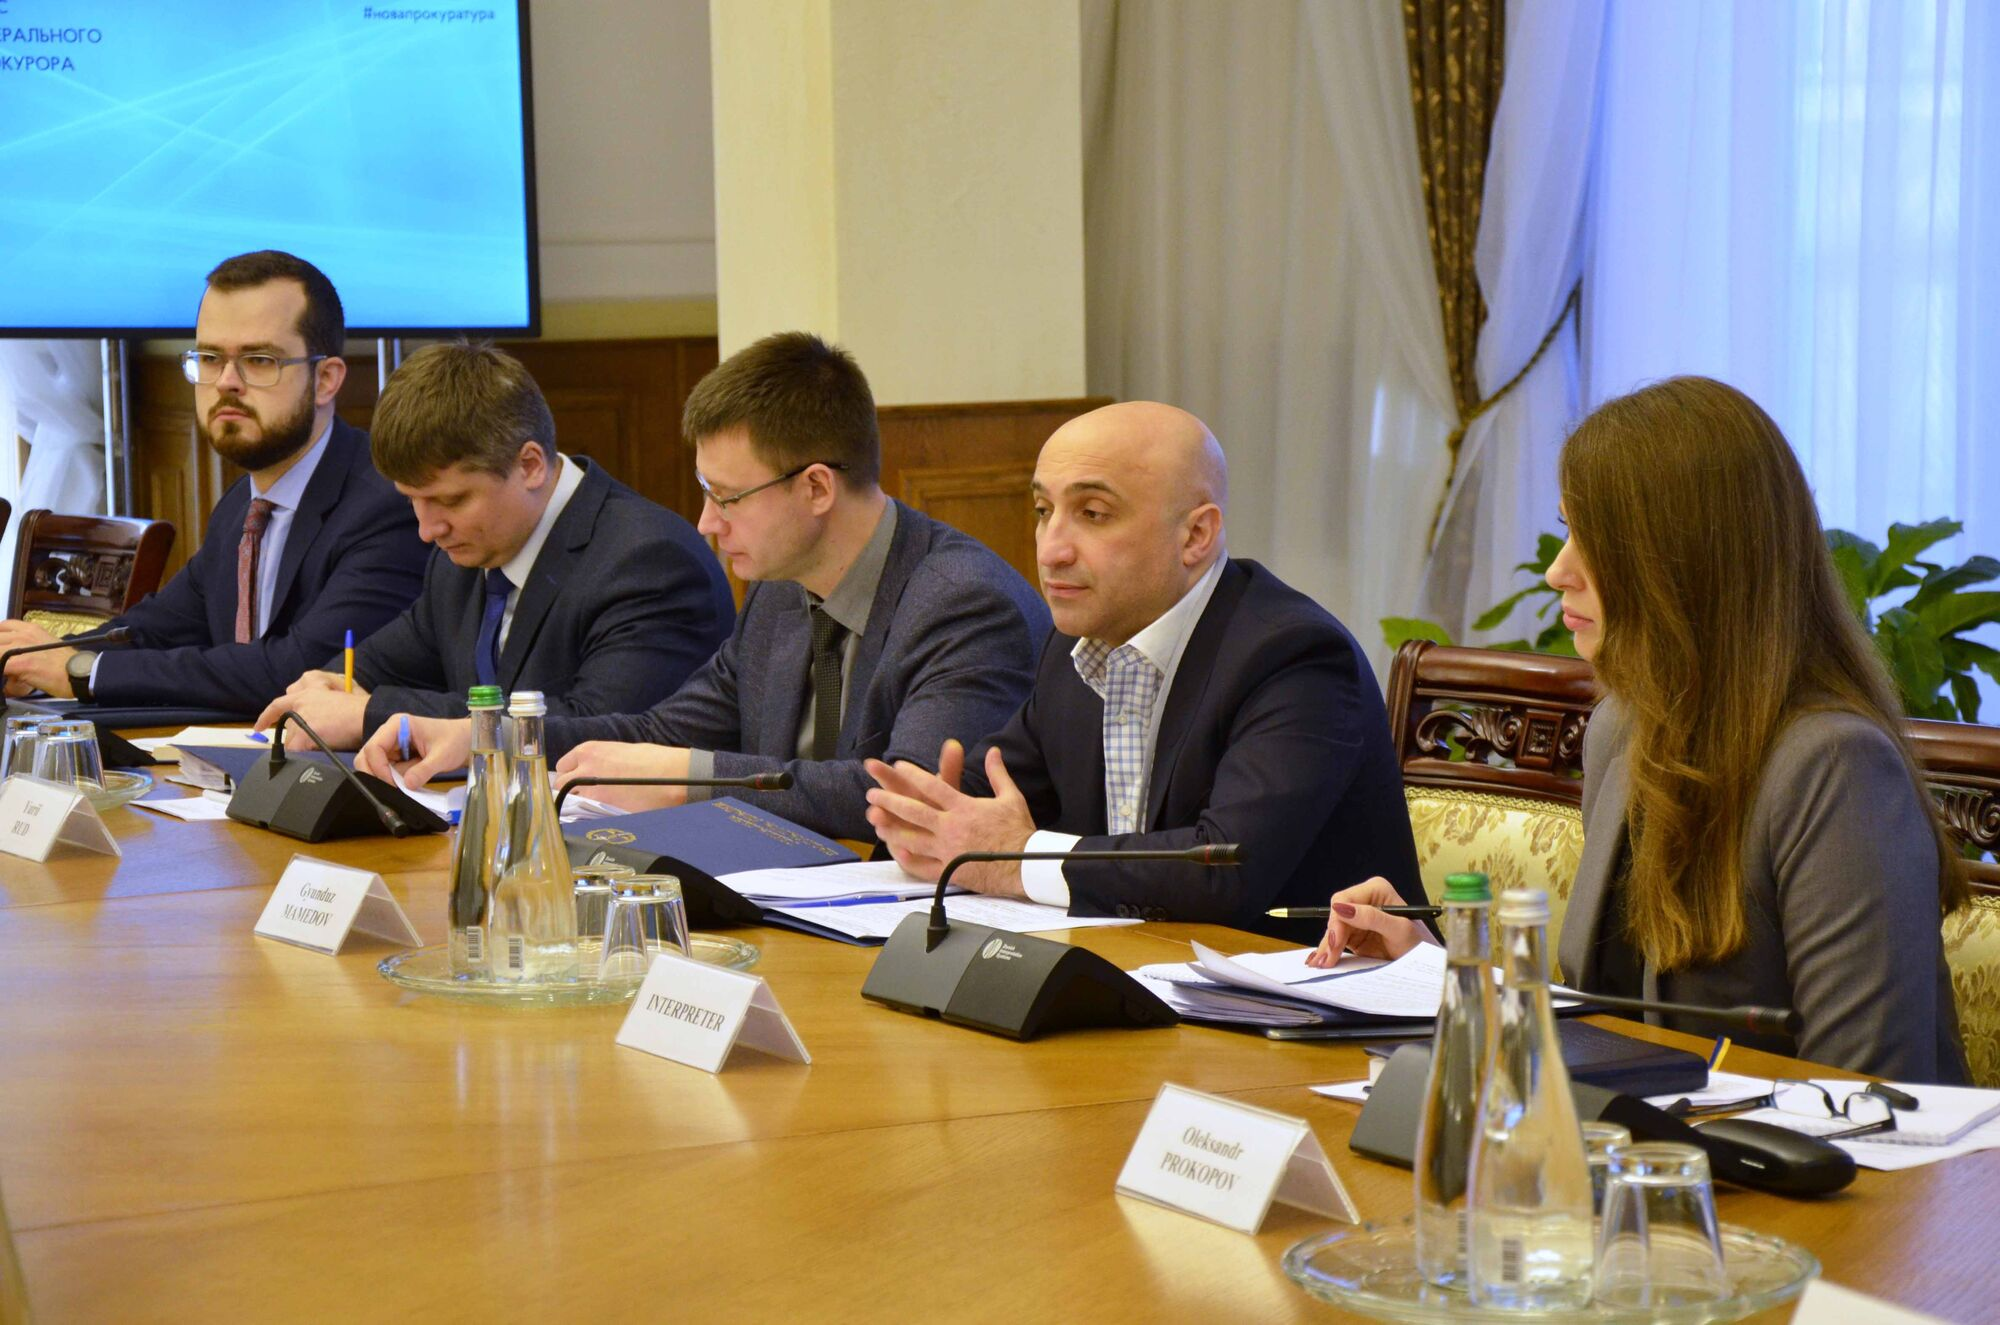 Гюндуз Мамедов на встрече с представителями Офиса прокурора Международного уголовного суда